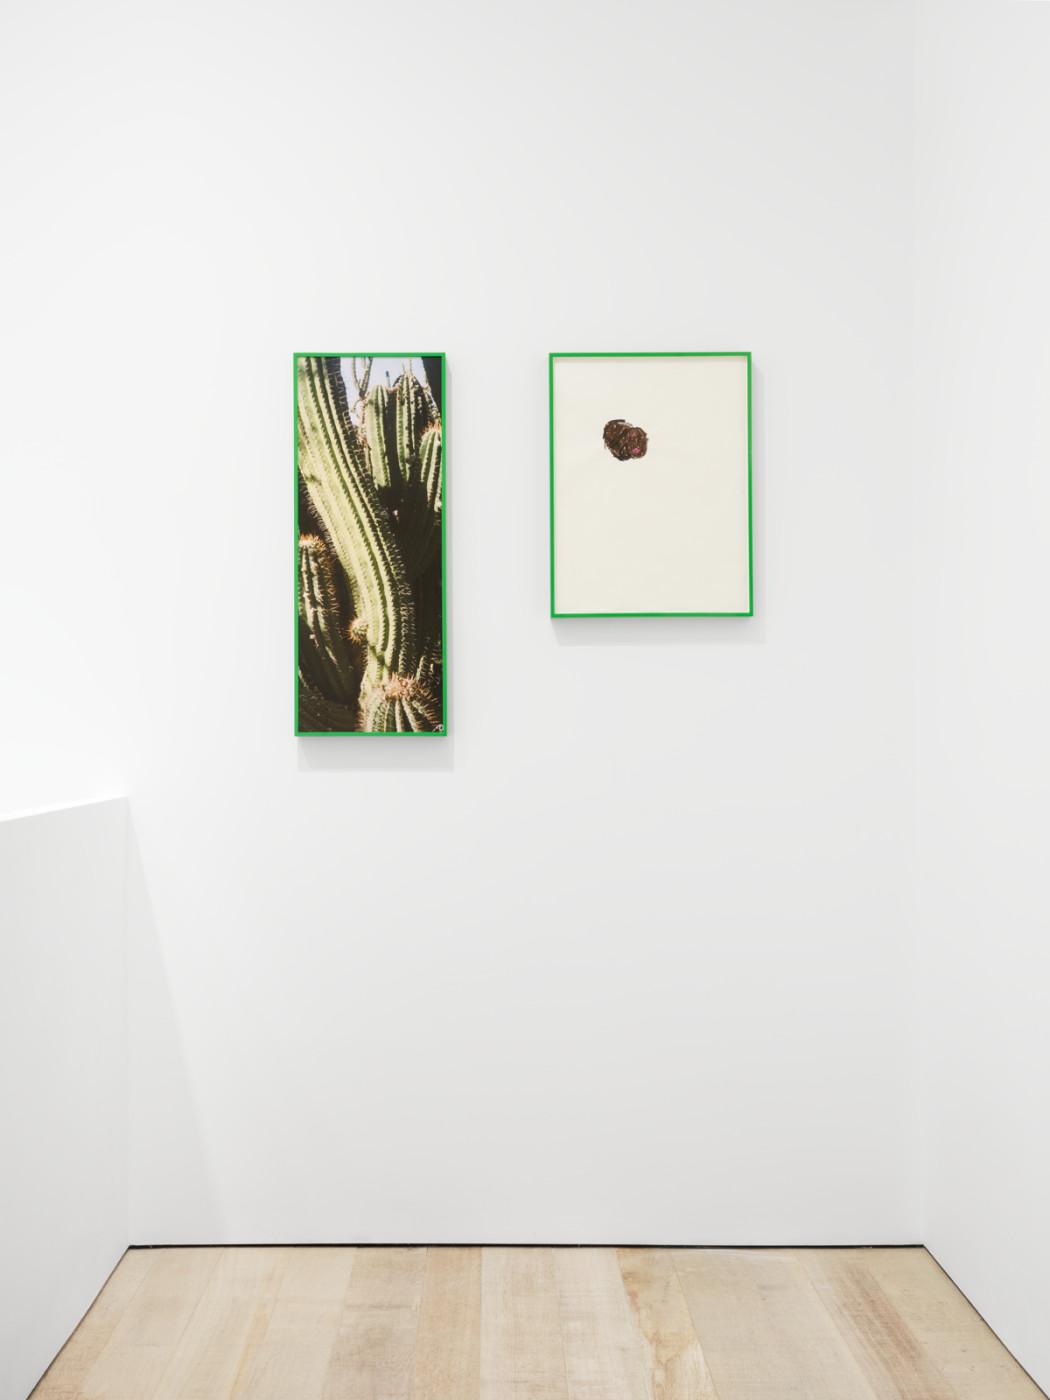 "<div class=""artwork_caption""><p>Installation view, Martine Syms,<em>SOFT</em>at Sadie Coles HQ, 8 Bury St, London, 25 May - 3 July 2021</p><p>Photography by Eva Herzog</p></div>"